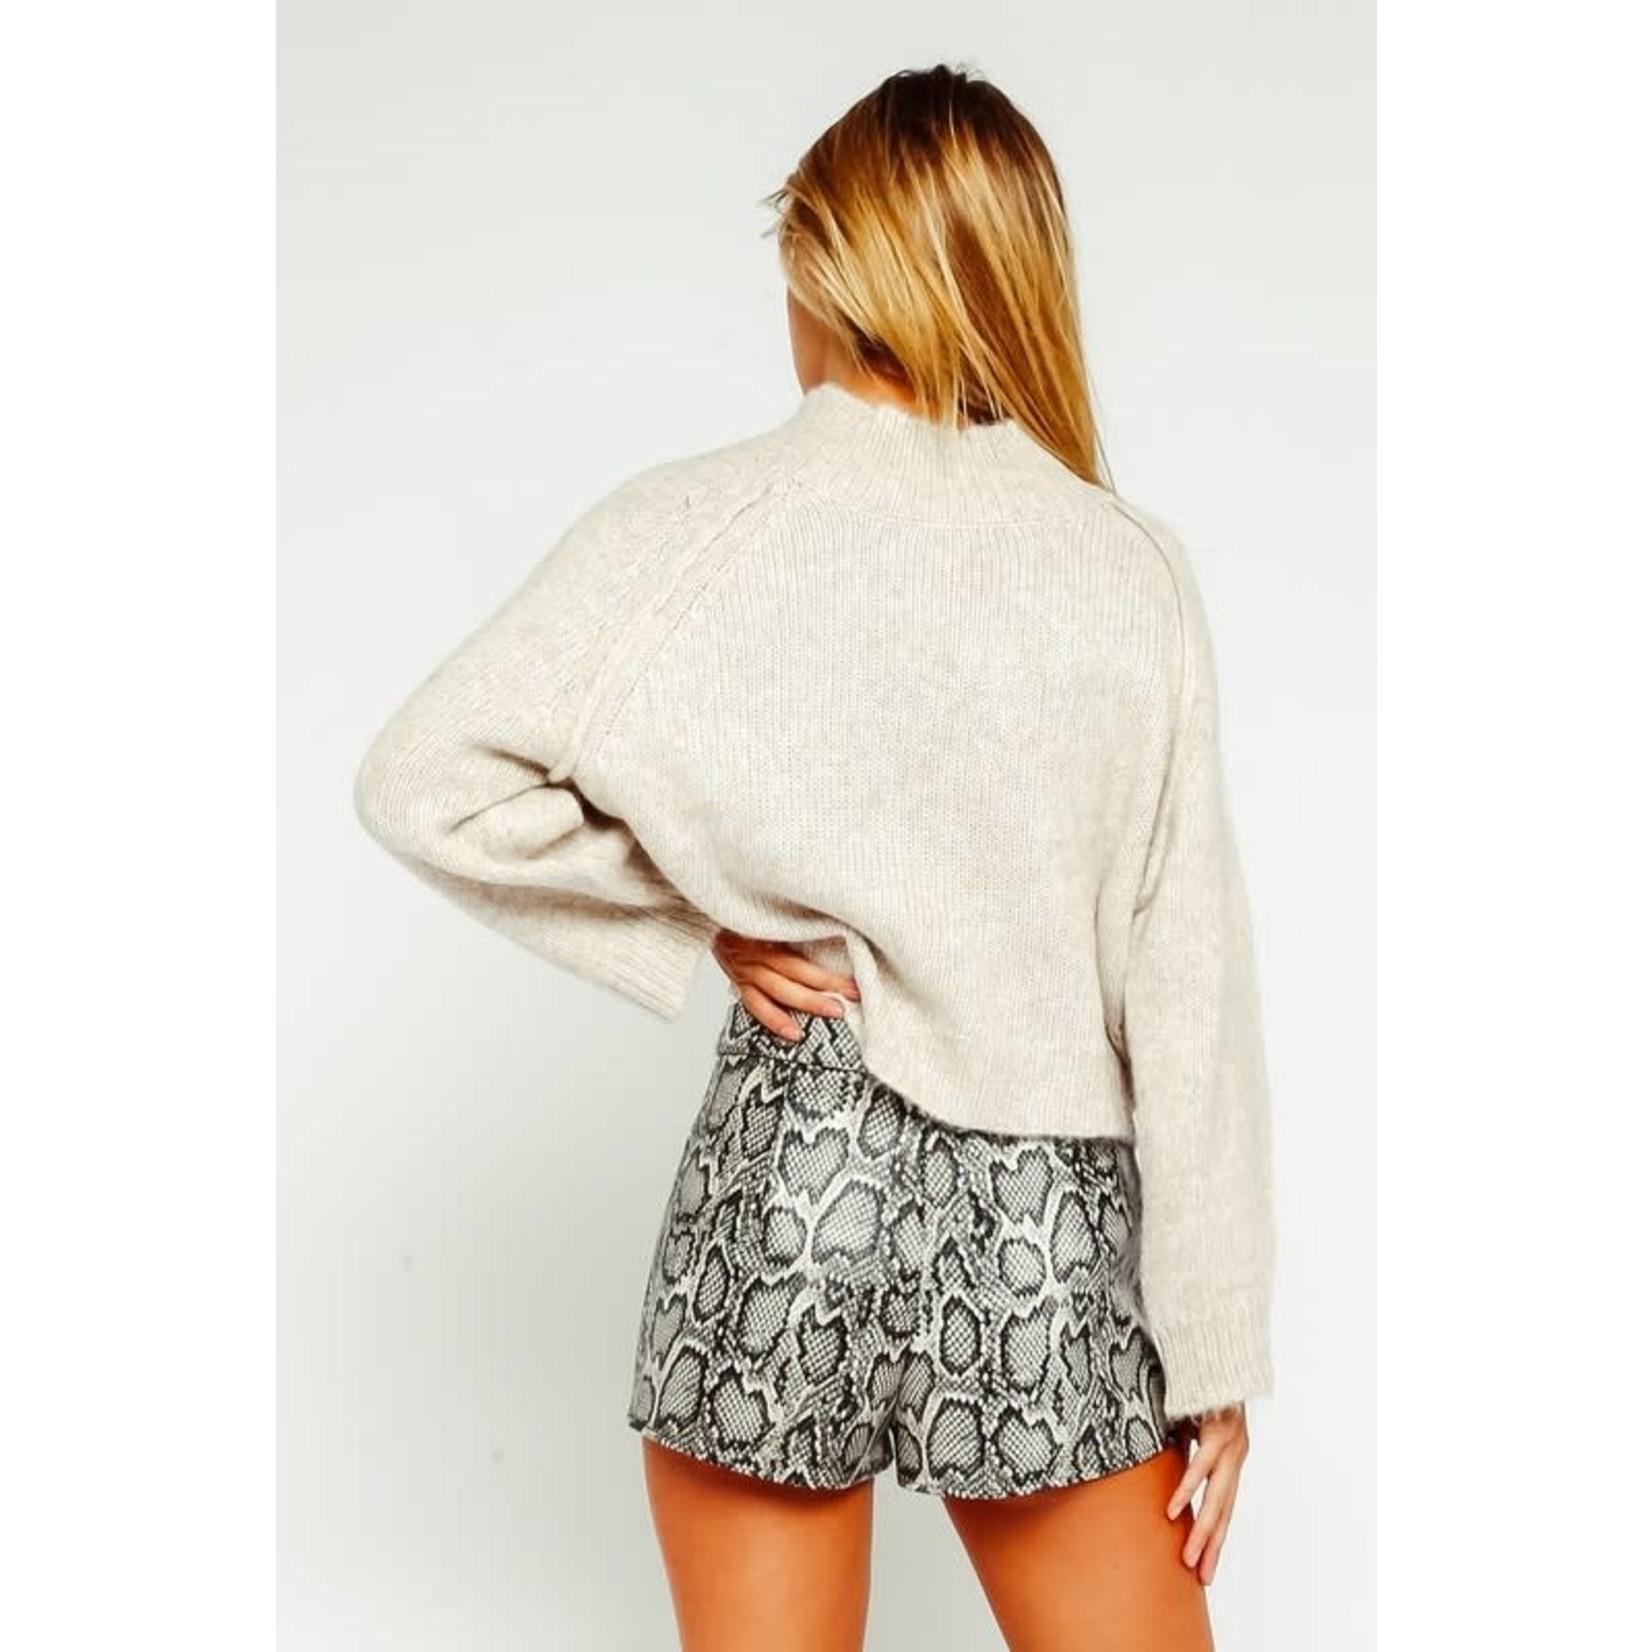 EM & ELLE Someone Like You Sweater